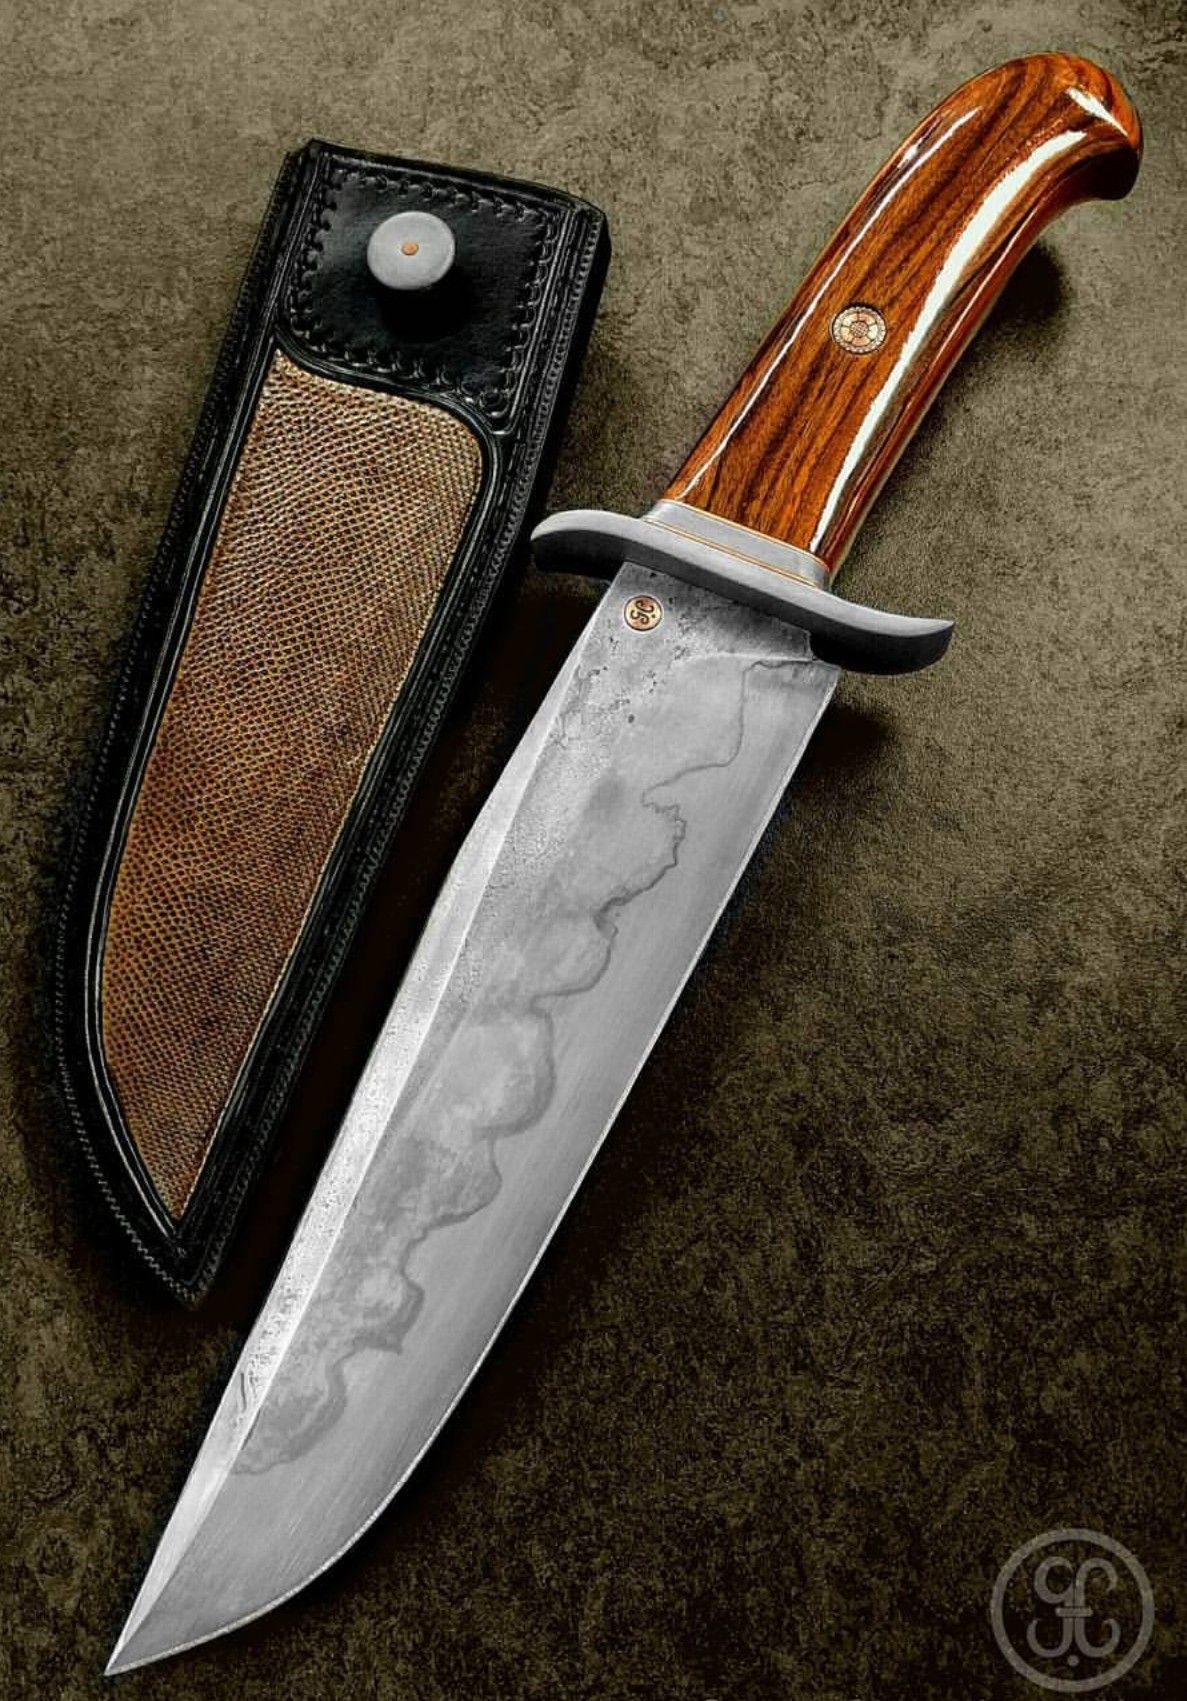 Pin de ale Marco en cuchilleria | Pinterest | Cuchillos, Damascos y ...